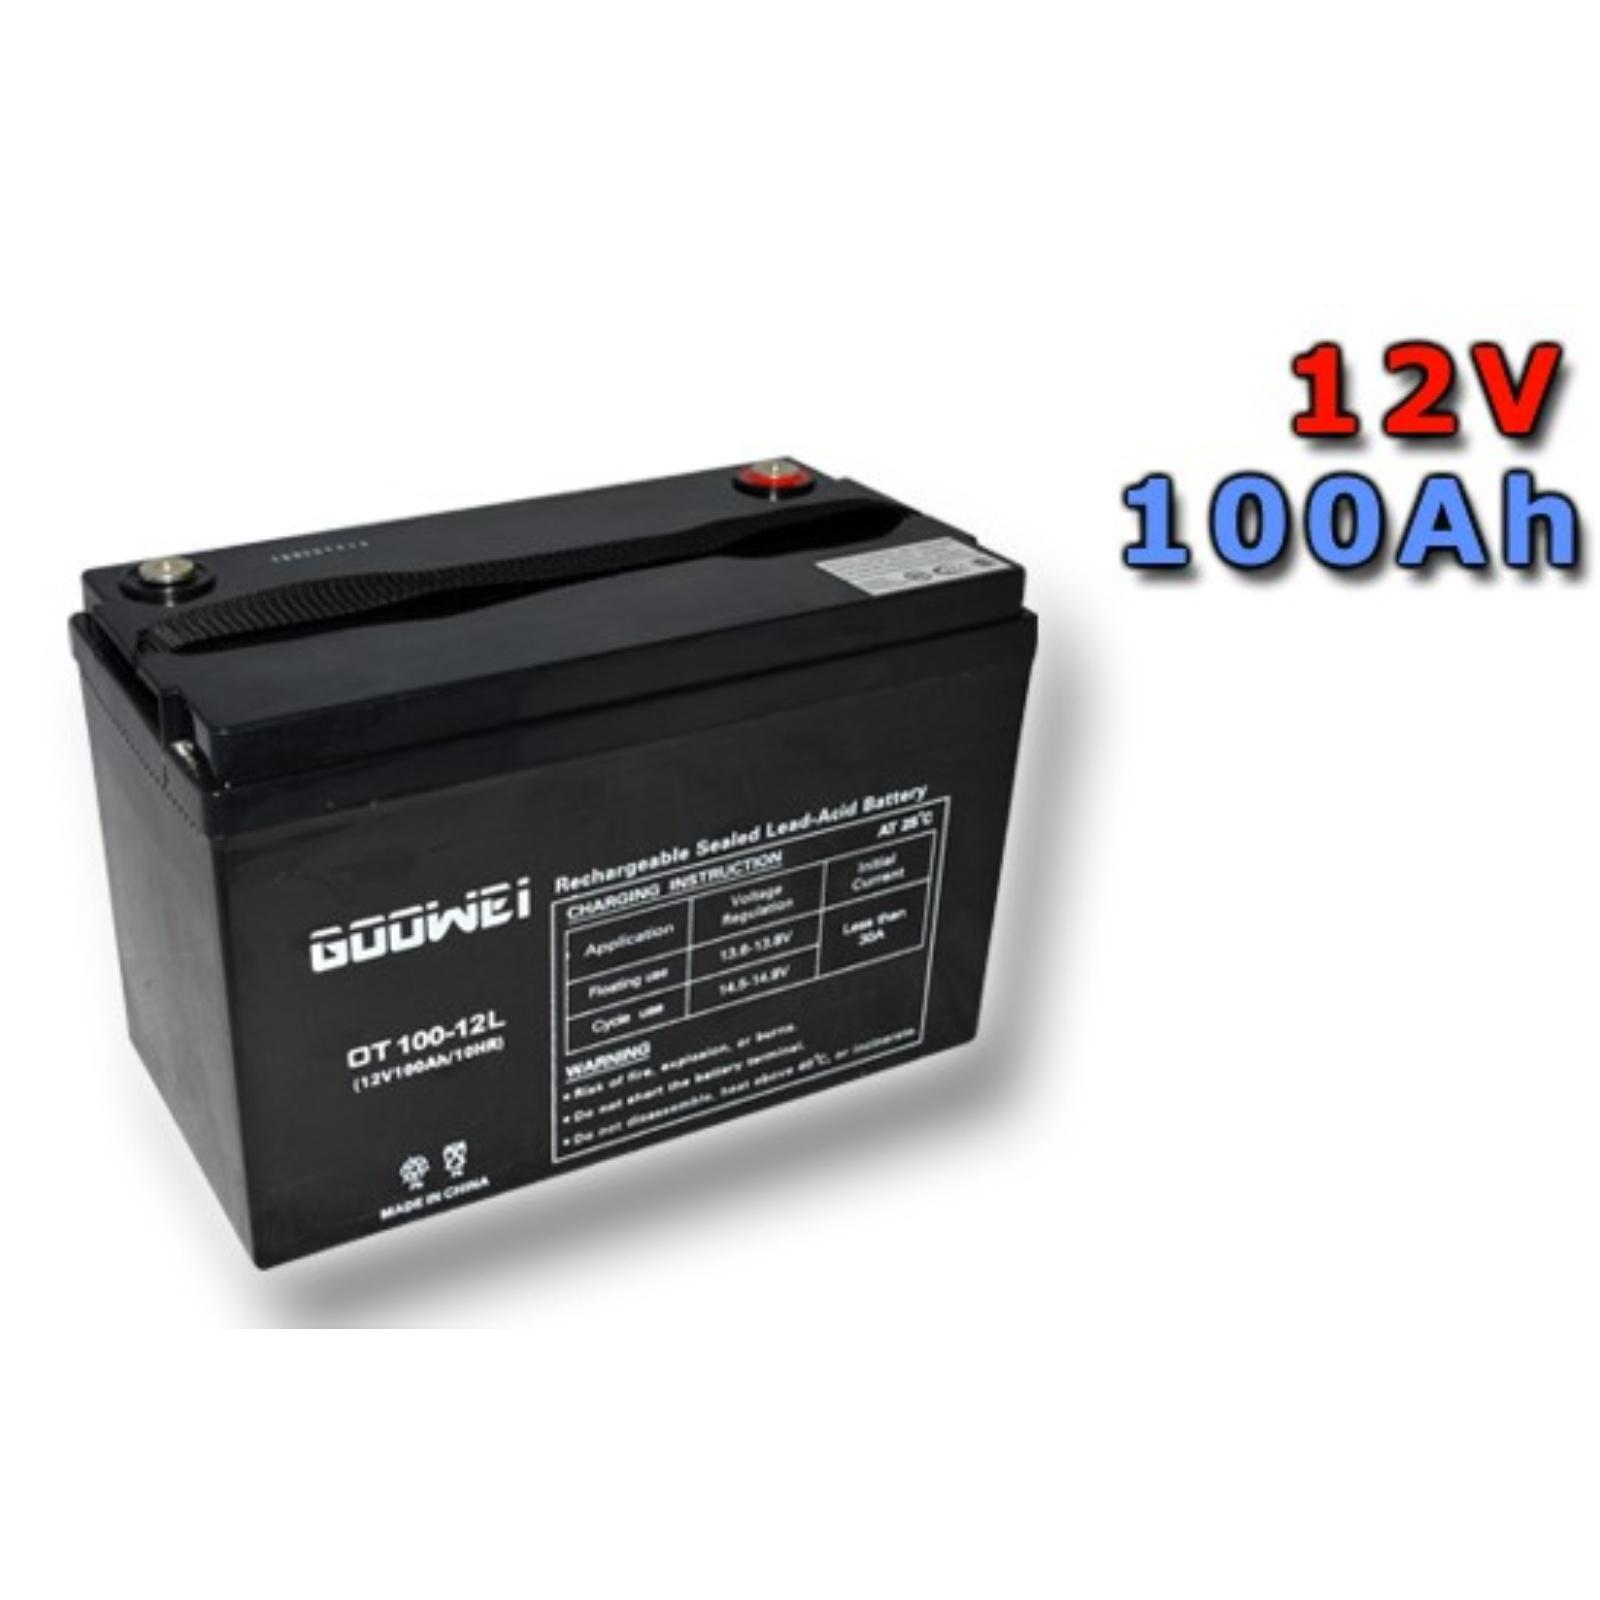 Trakční gelová baterie GOOWEI OTL100-12 100Ah